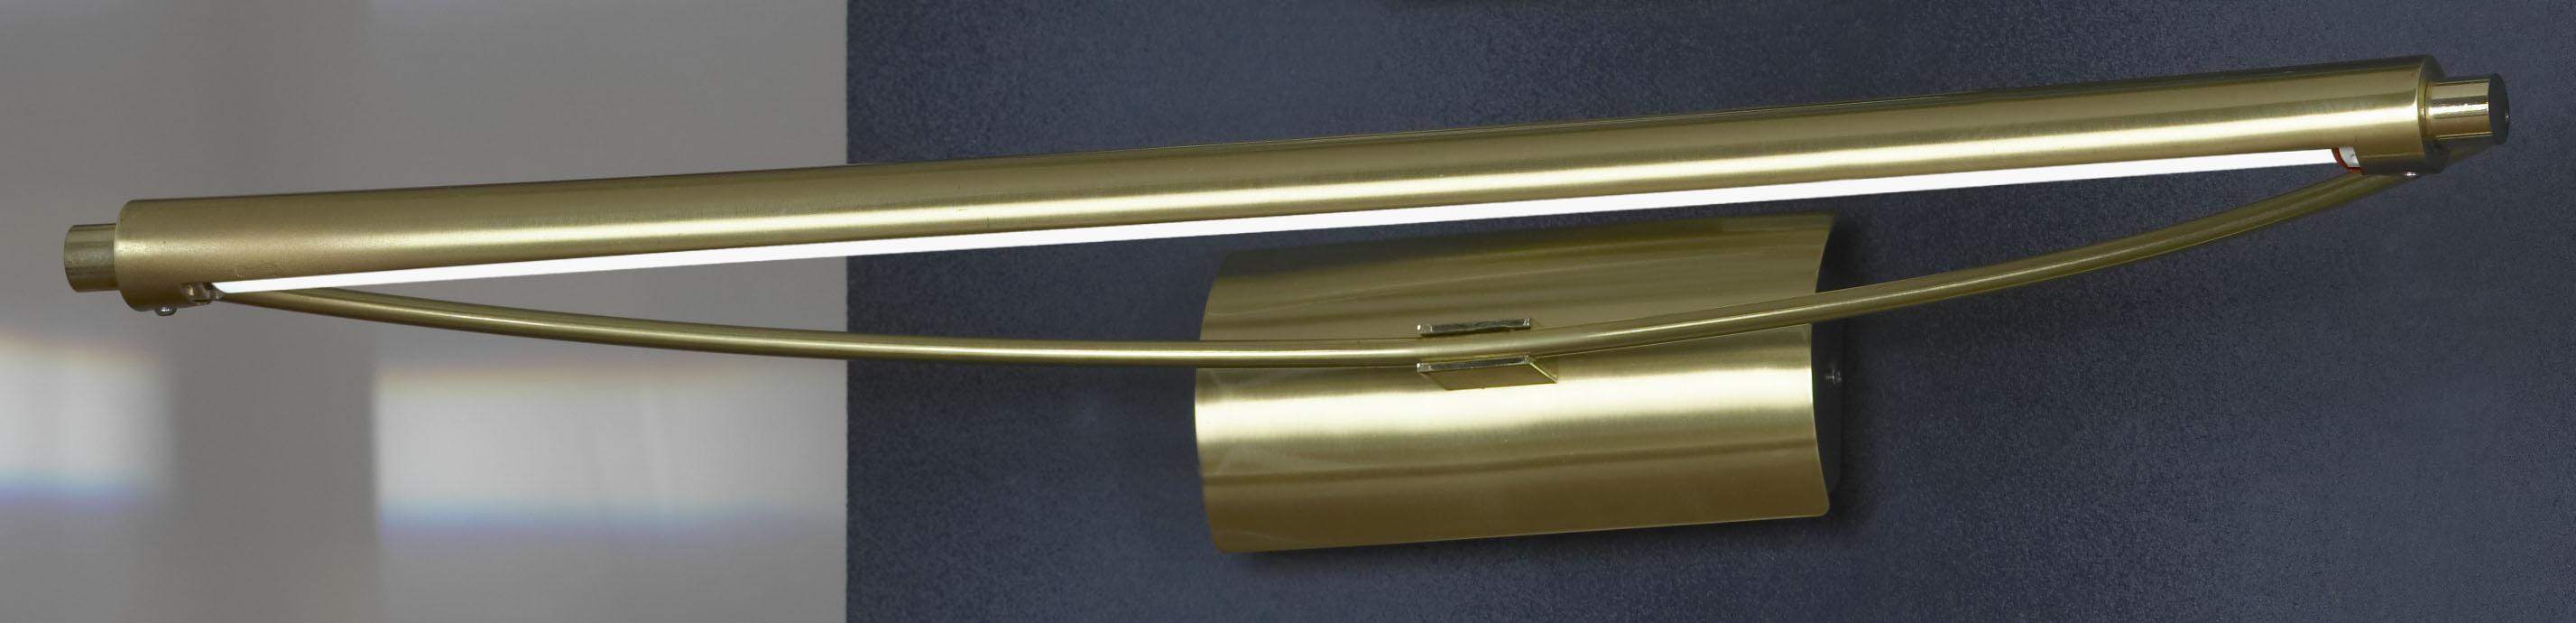 Подсветка для картин Lussole Lsl-6251-01